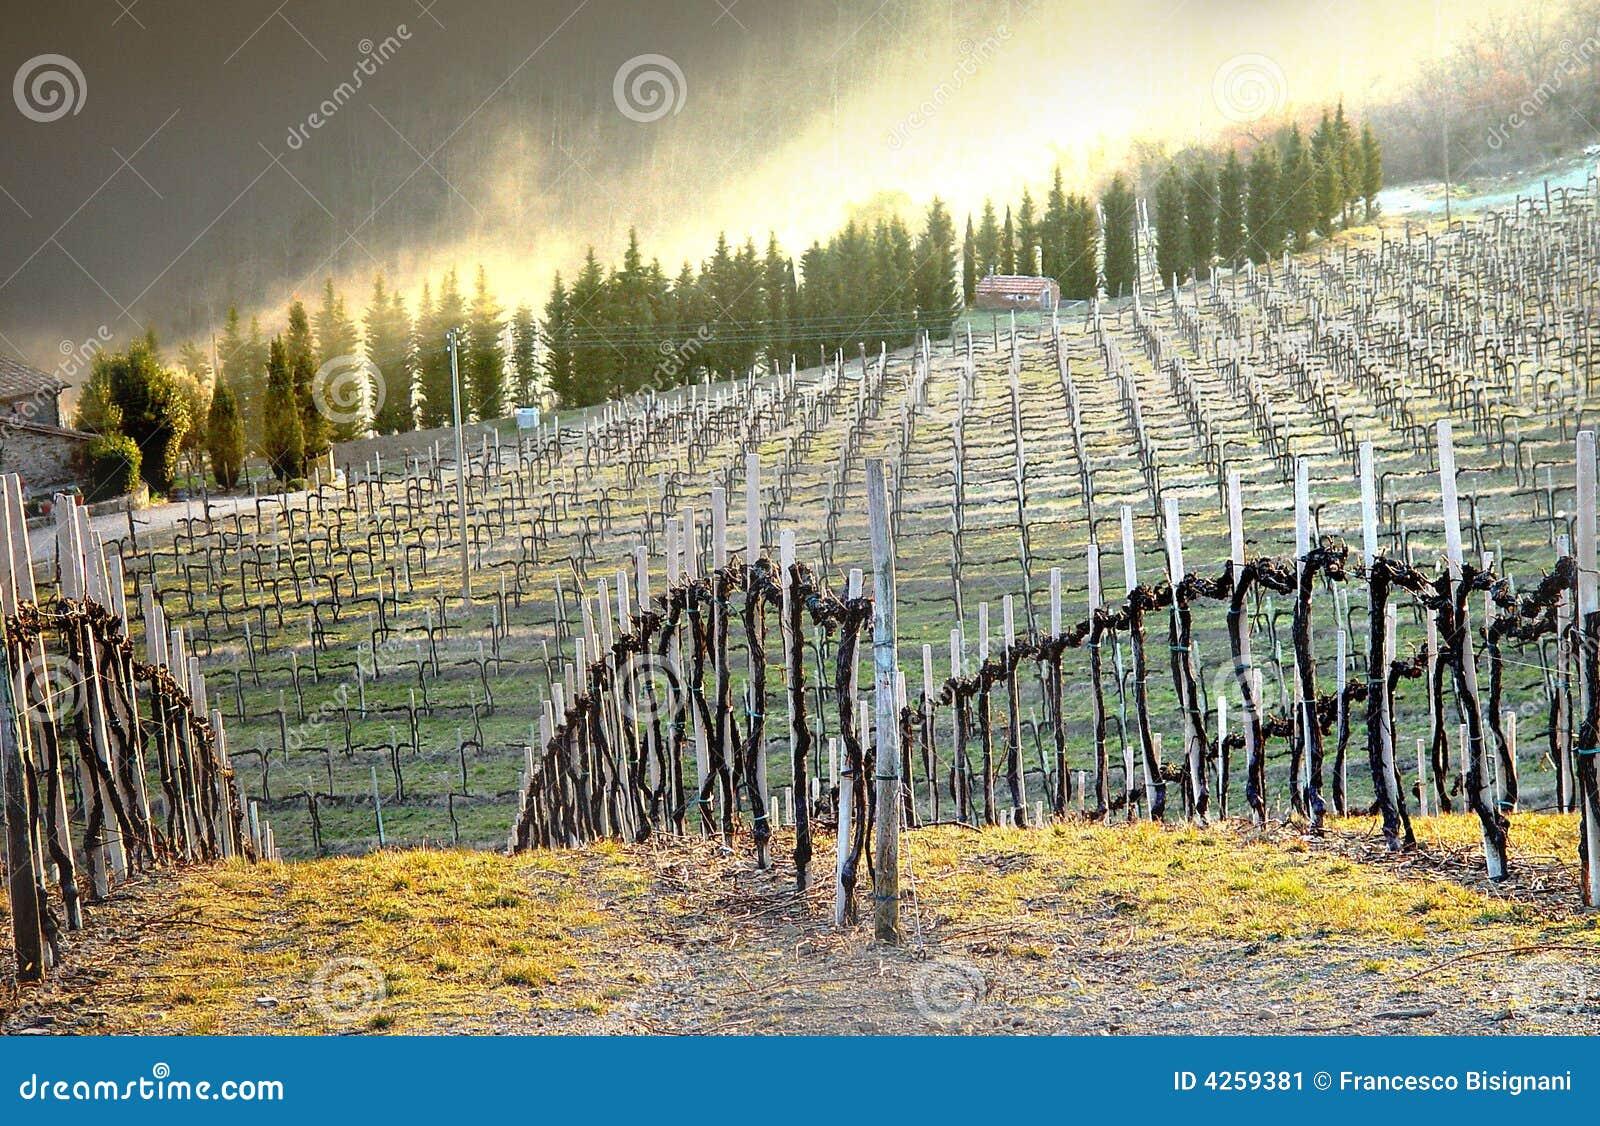 Vineyard - Chianti, Italy